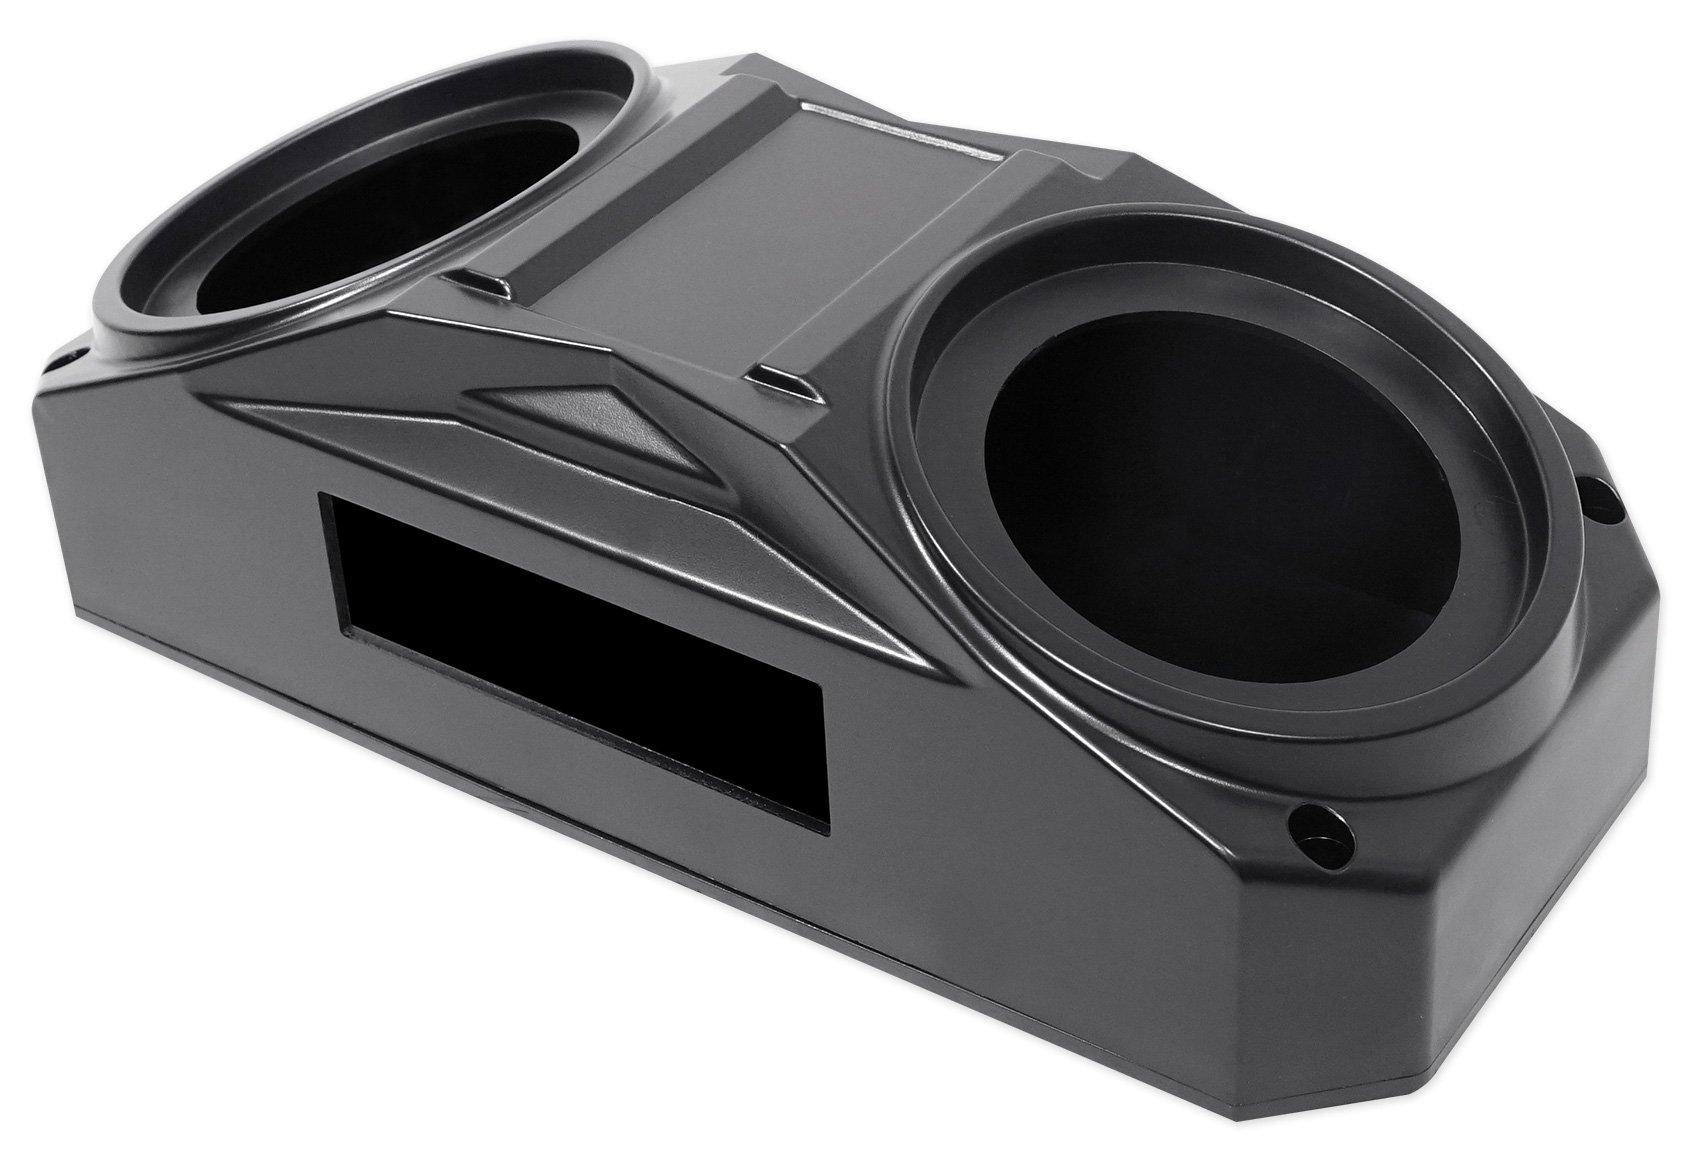 Metra OH-DIN01 6.5'' Overhead Speaker+Receiver Enclosure Polaris RZR/ATV/UTV/Cart by Metra (Image #2)